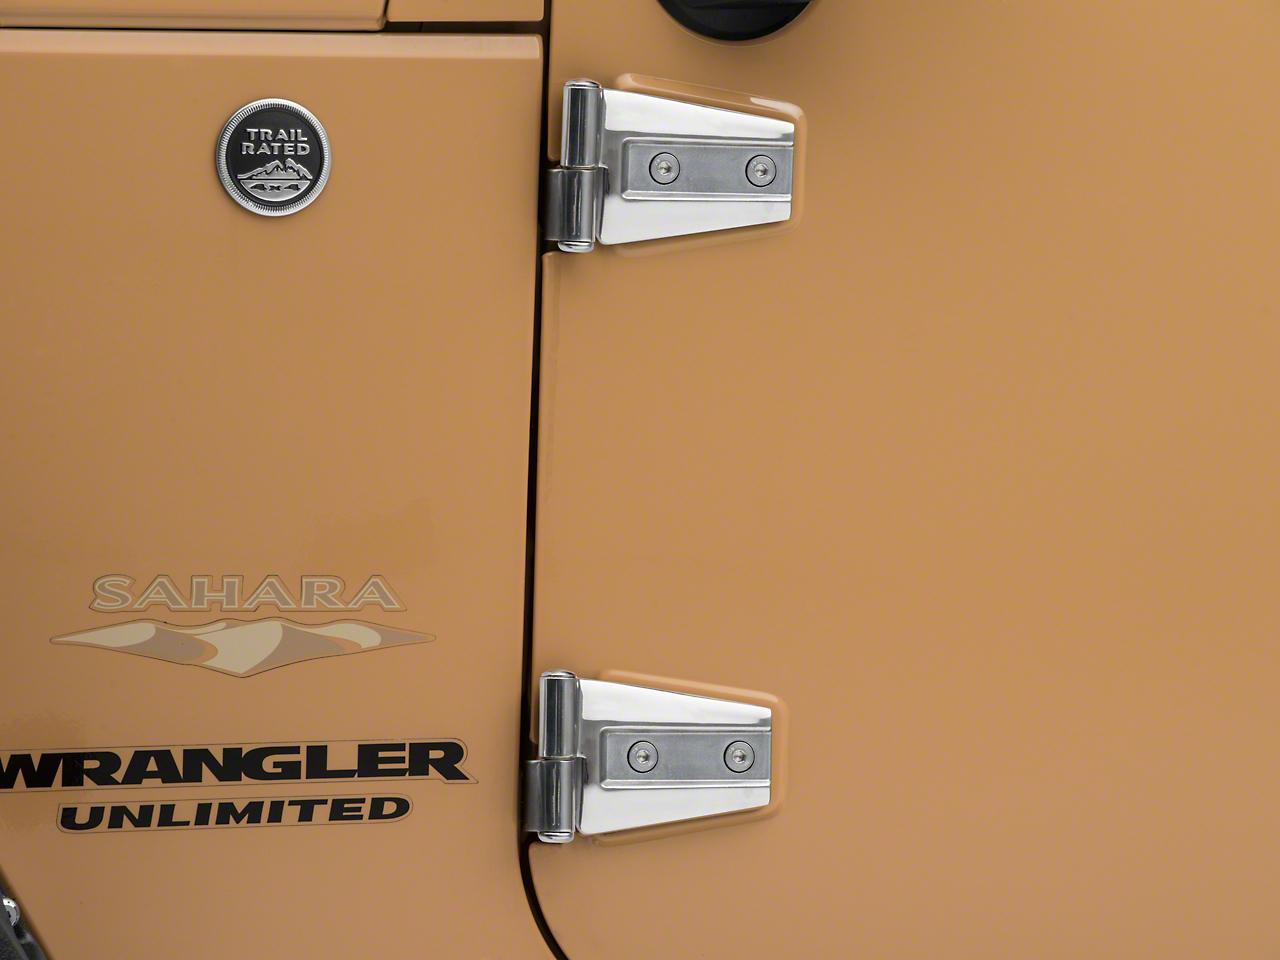 Smittybilt Door Hinges - Stainless Steel (07-18 Wrangler JK)